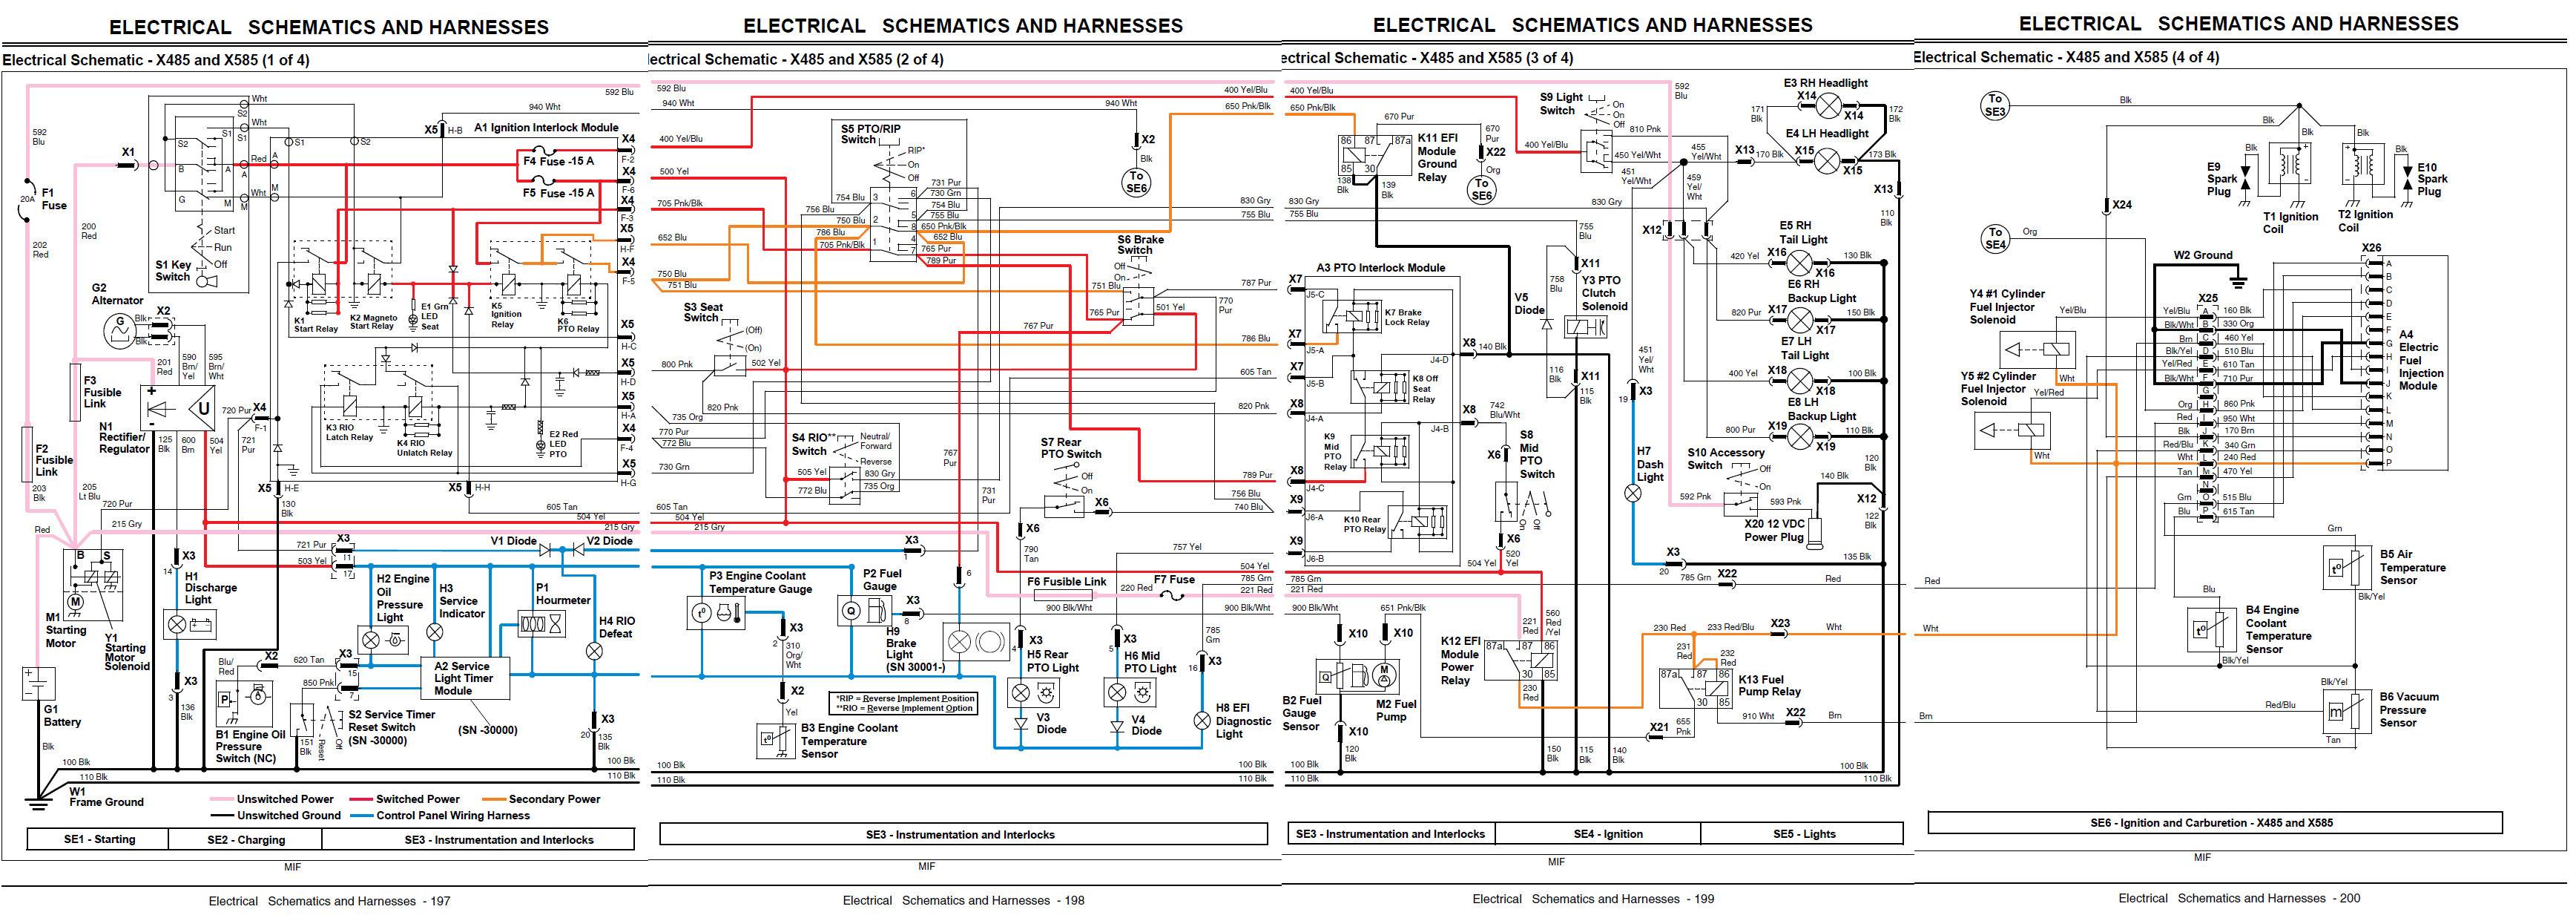 Help john deere x585 | Page 2 | My Tractor Forum John Deere X Wiring Diagram on john deere solenoid wiring diagram, john deere z445 wiring diagram, john deere gt242 wiring diagram, john deere x534 wiring diagram, john deere lt180 wiring diagram, john deere x495 wiring diagram, john deere z245 wiring diagram, john deere ignition wiring diagram, john deere tractor wiring diagrams, john deere lx280 wiring diagram, john deere lx279 wiring diagram, john deere gt245 wiring diagram, john deere la115 wiring diagram, john deere x304 wiring diagram, john deere x475 wiring diagram, john deere x324 wiring diagram, john deere x720 wiring diagram, john deere x740 wiring diagram, john deere x360 wiring diagram, john deere gx335 wiring diagram,